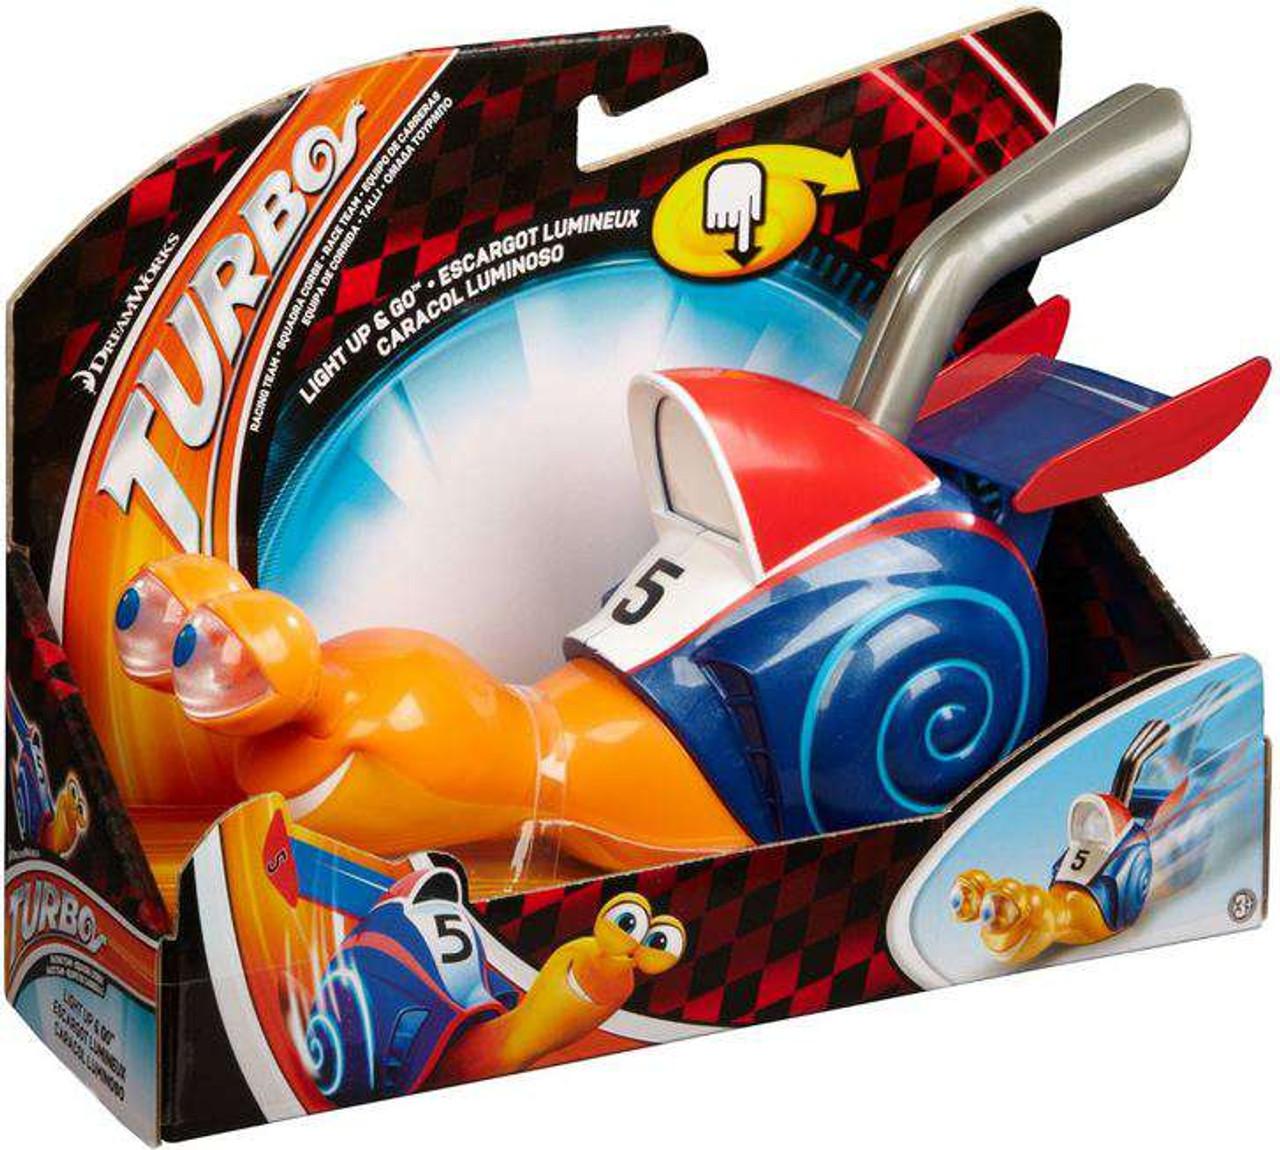 Light Up & Go Turbo Figure